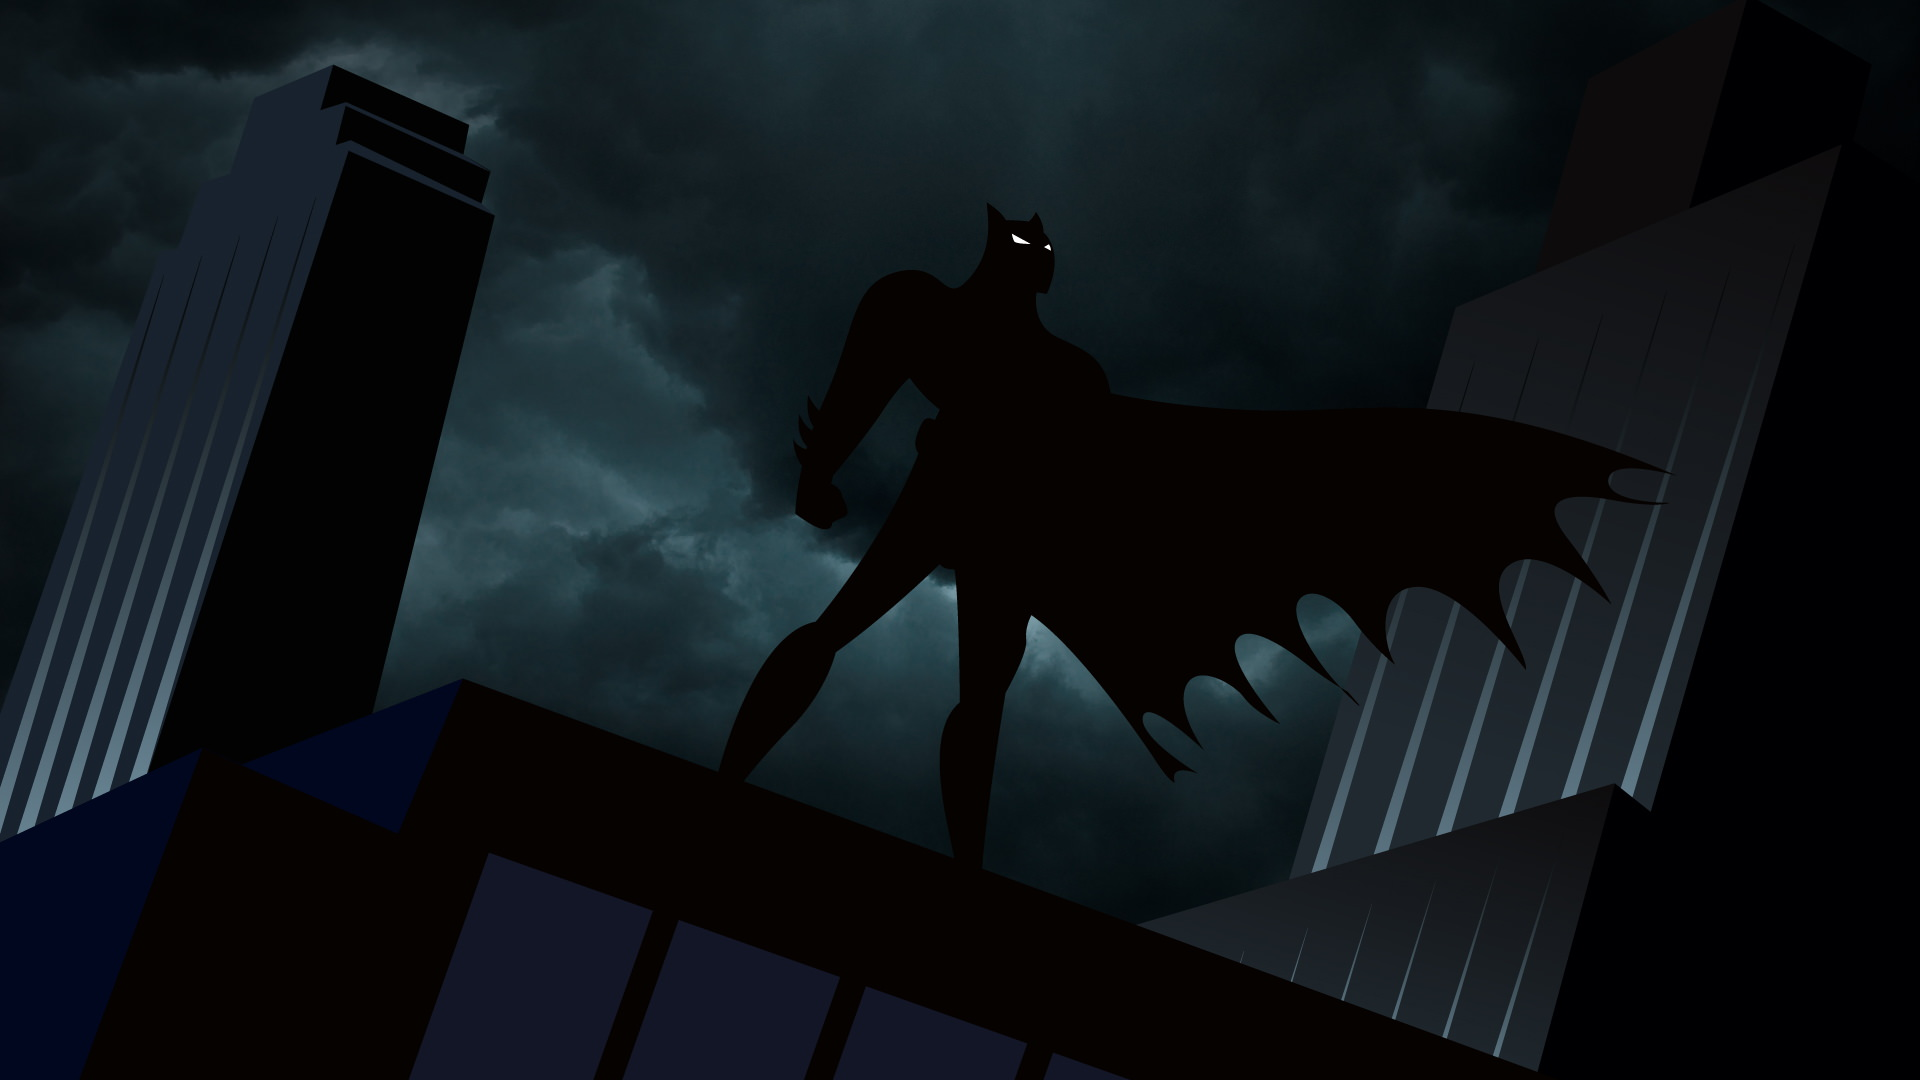 batman images free download, batman mobile wallpaper